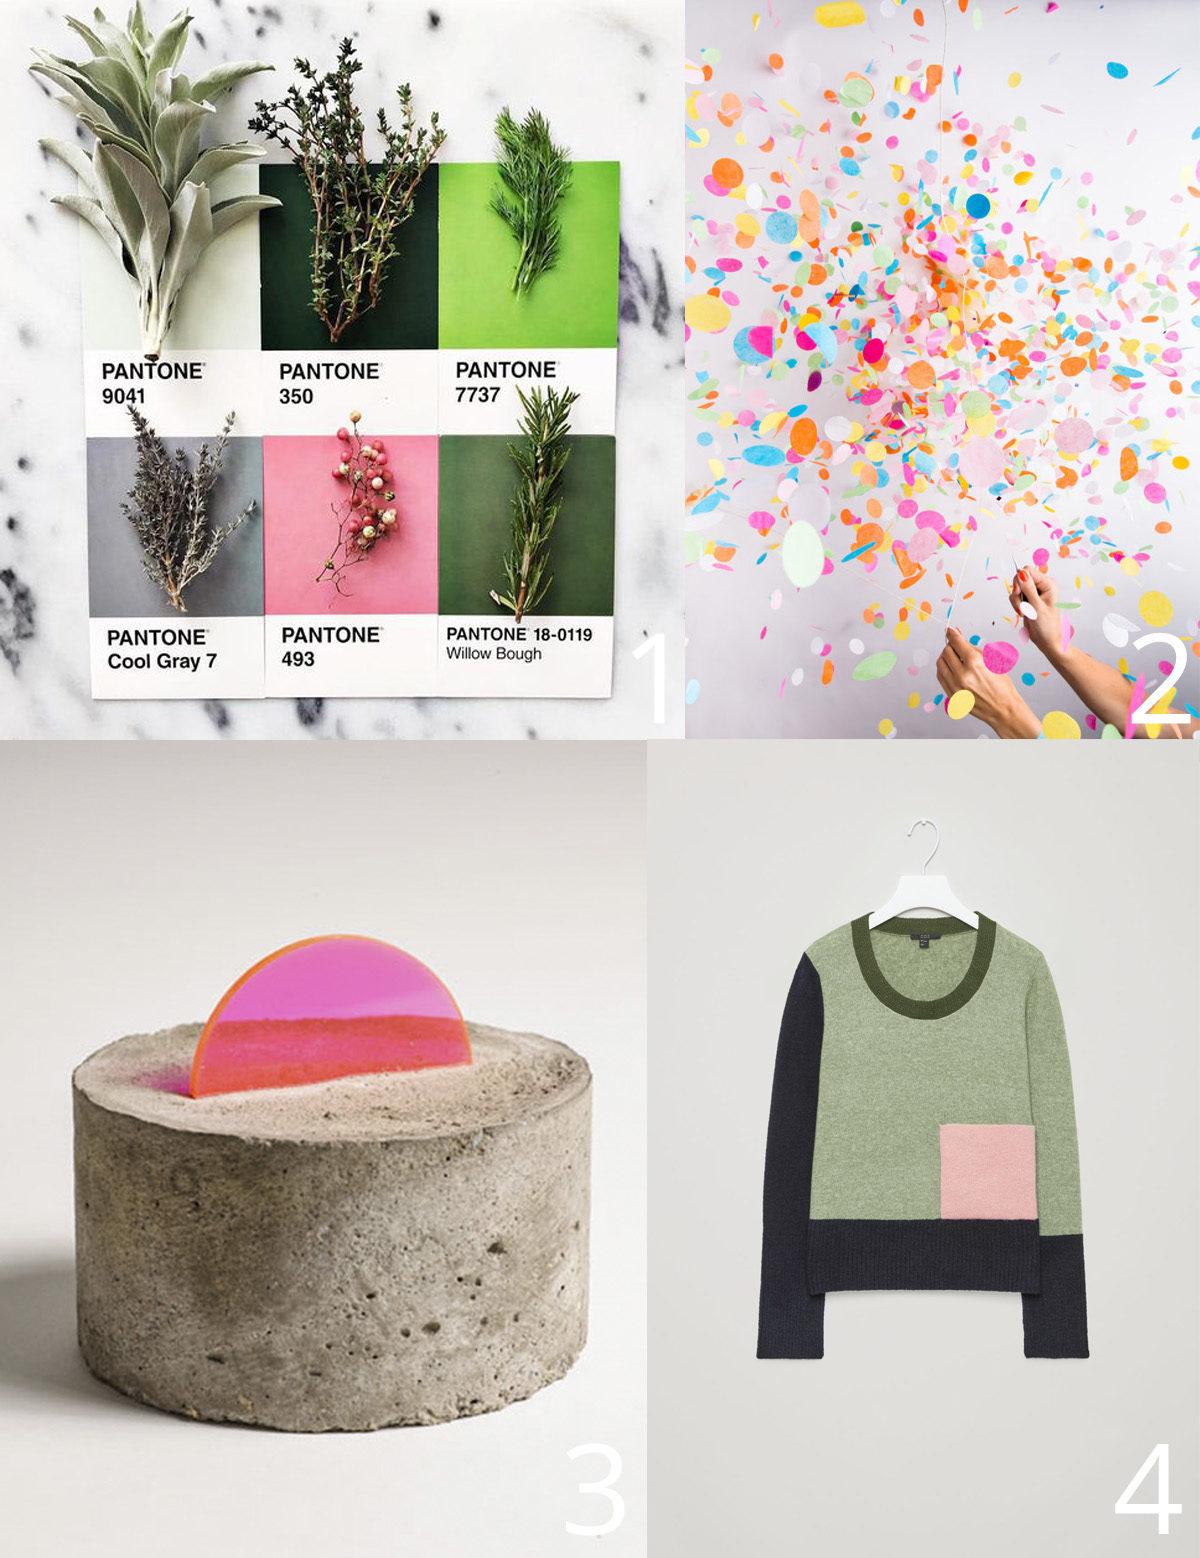 Four fun things: sweatshirt, confetti, sculpture, pantone colors